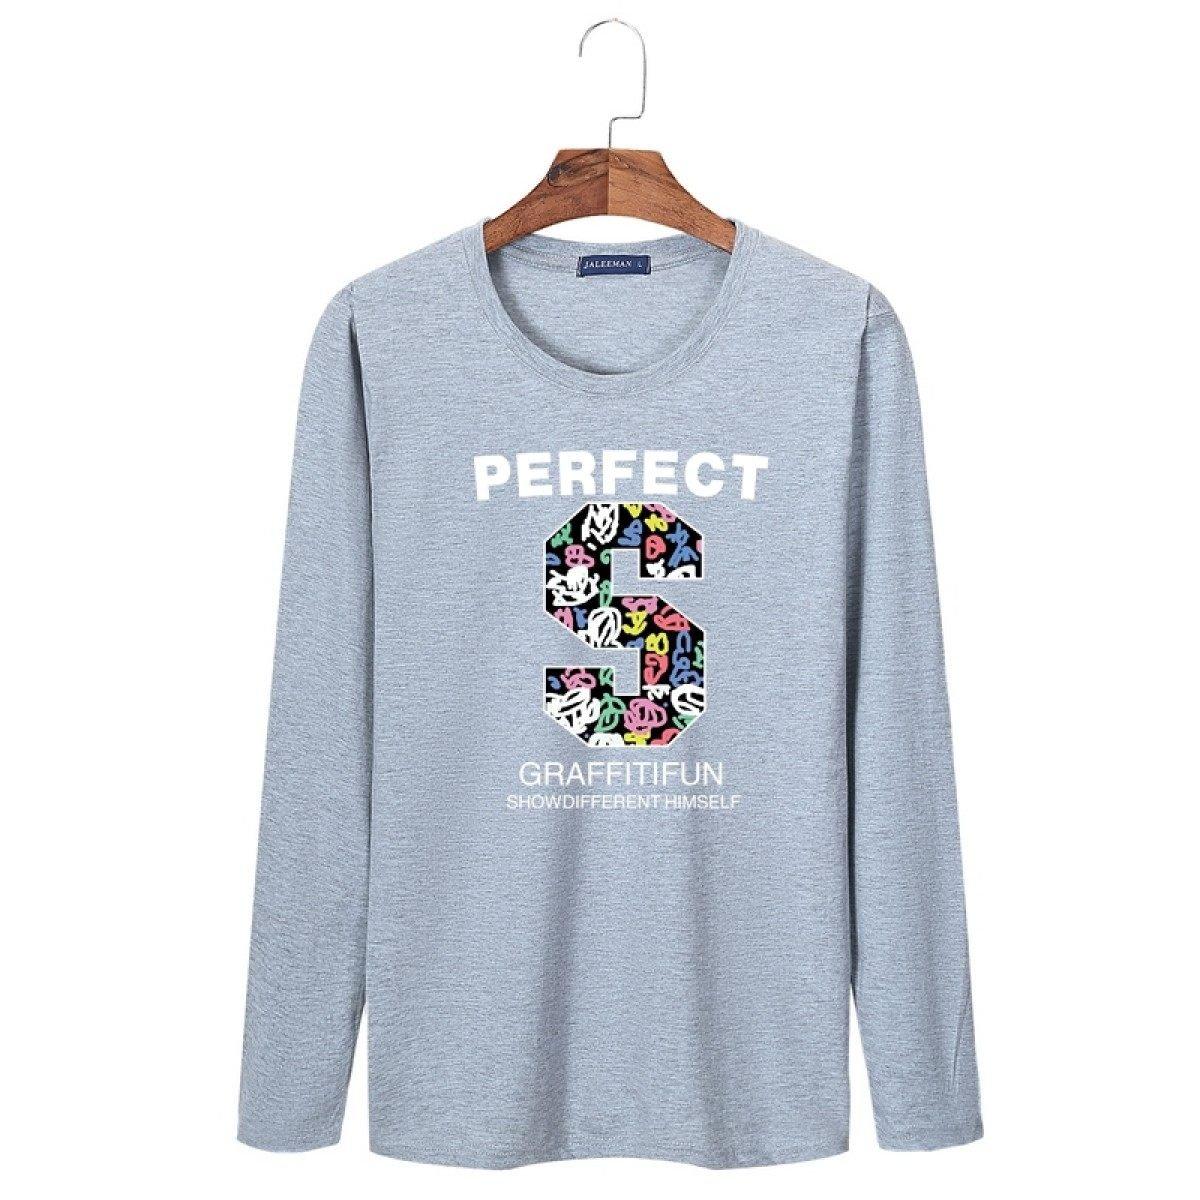 Männer Pullover Langarm T-Shirt Herbst Rundhalsausschnitt Große Größe Solid Farbe Compassionate Self-Anbau Pullover Frühling